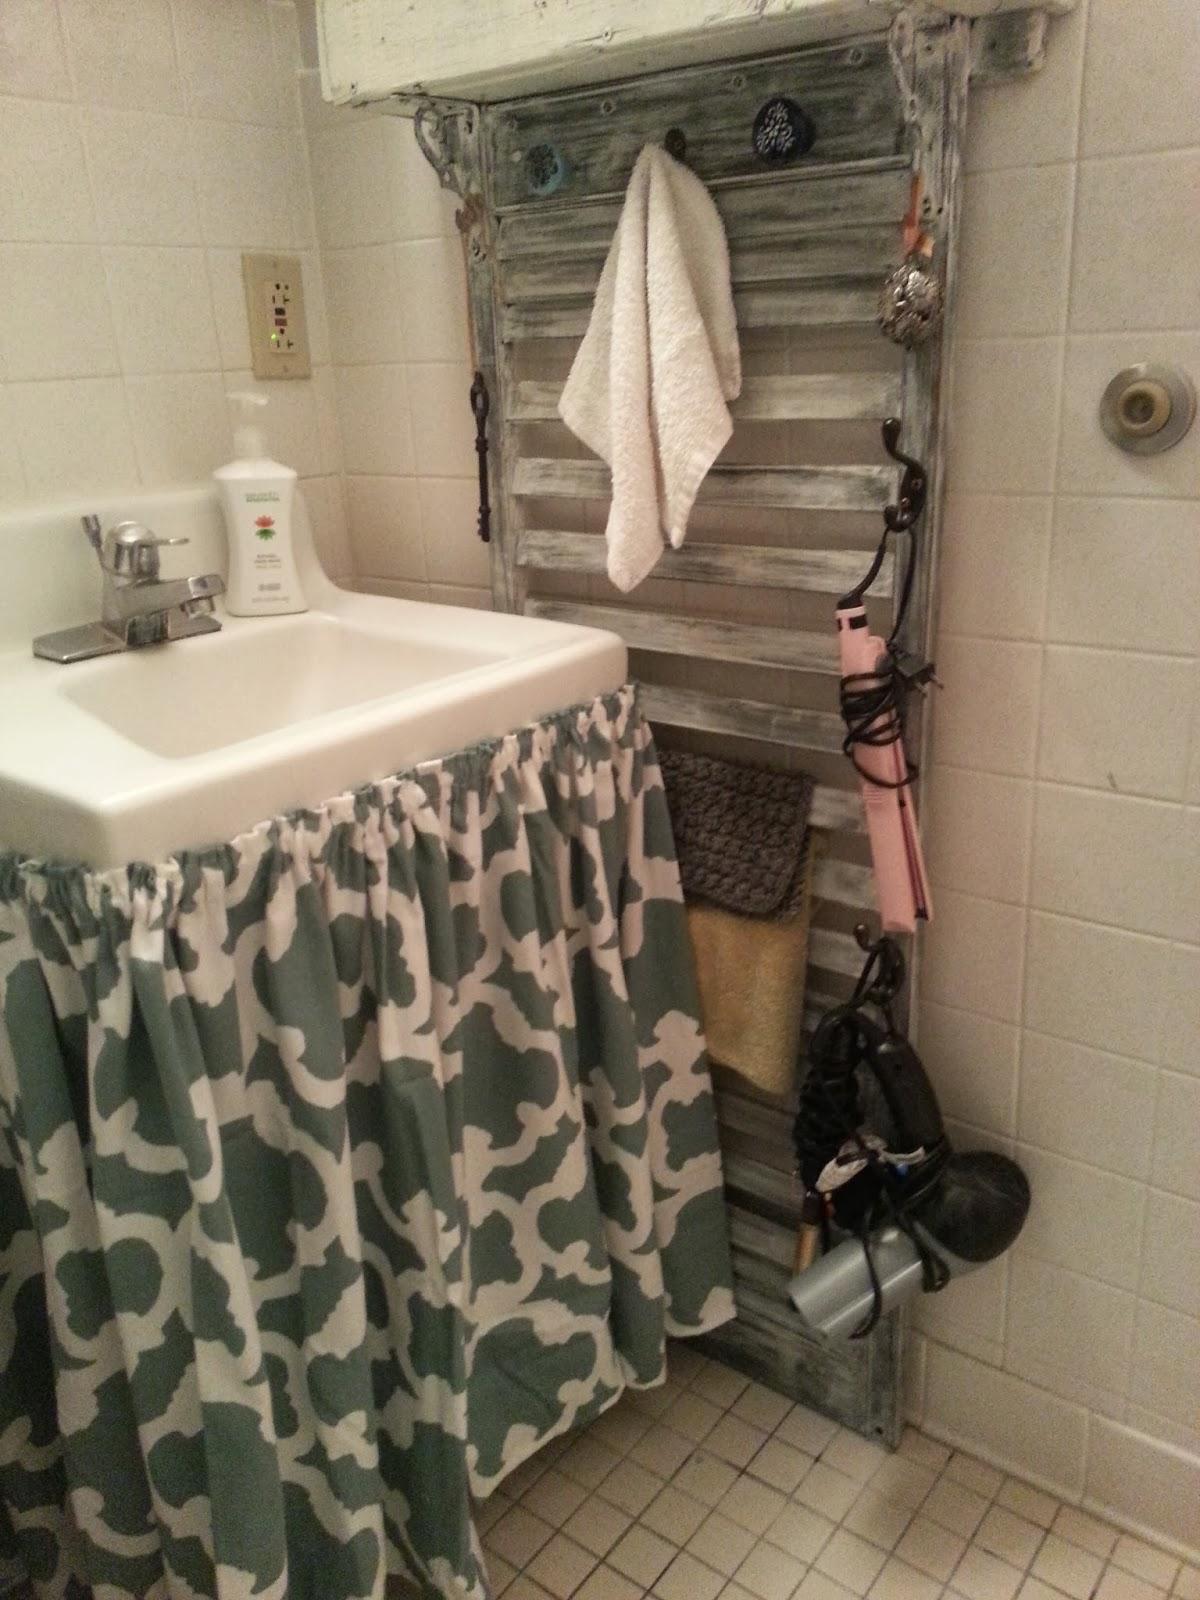 MY BATHROOM SINK CURTAIN